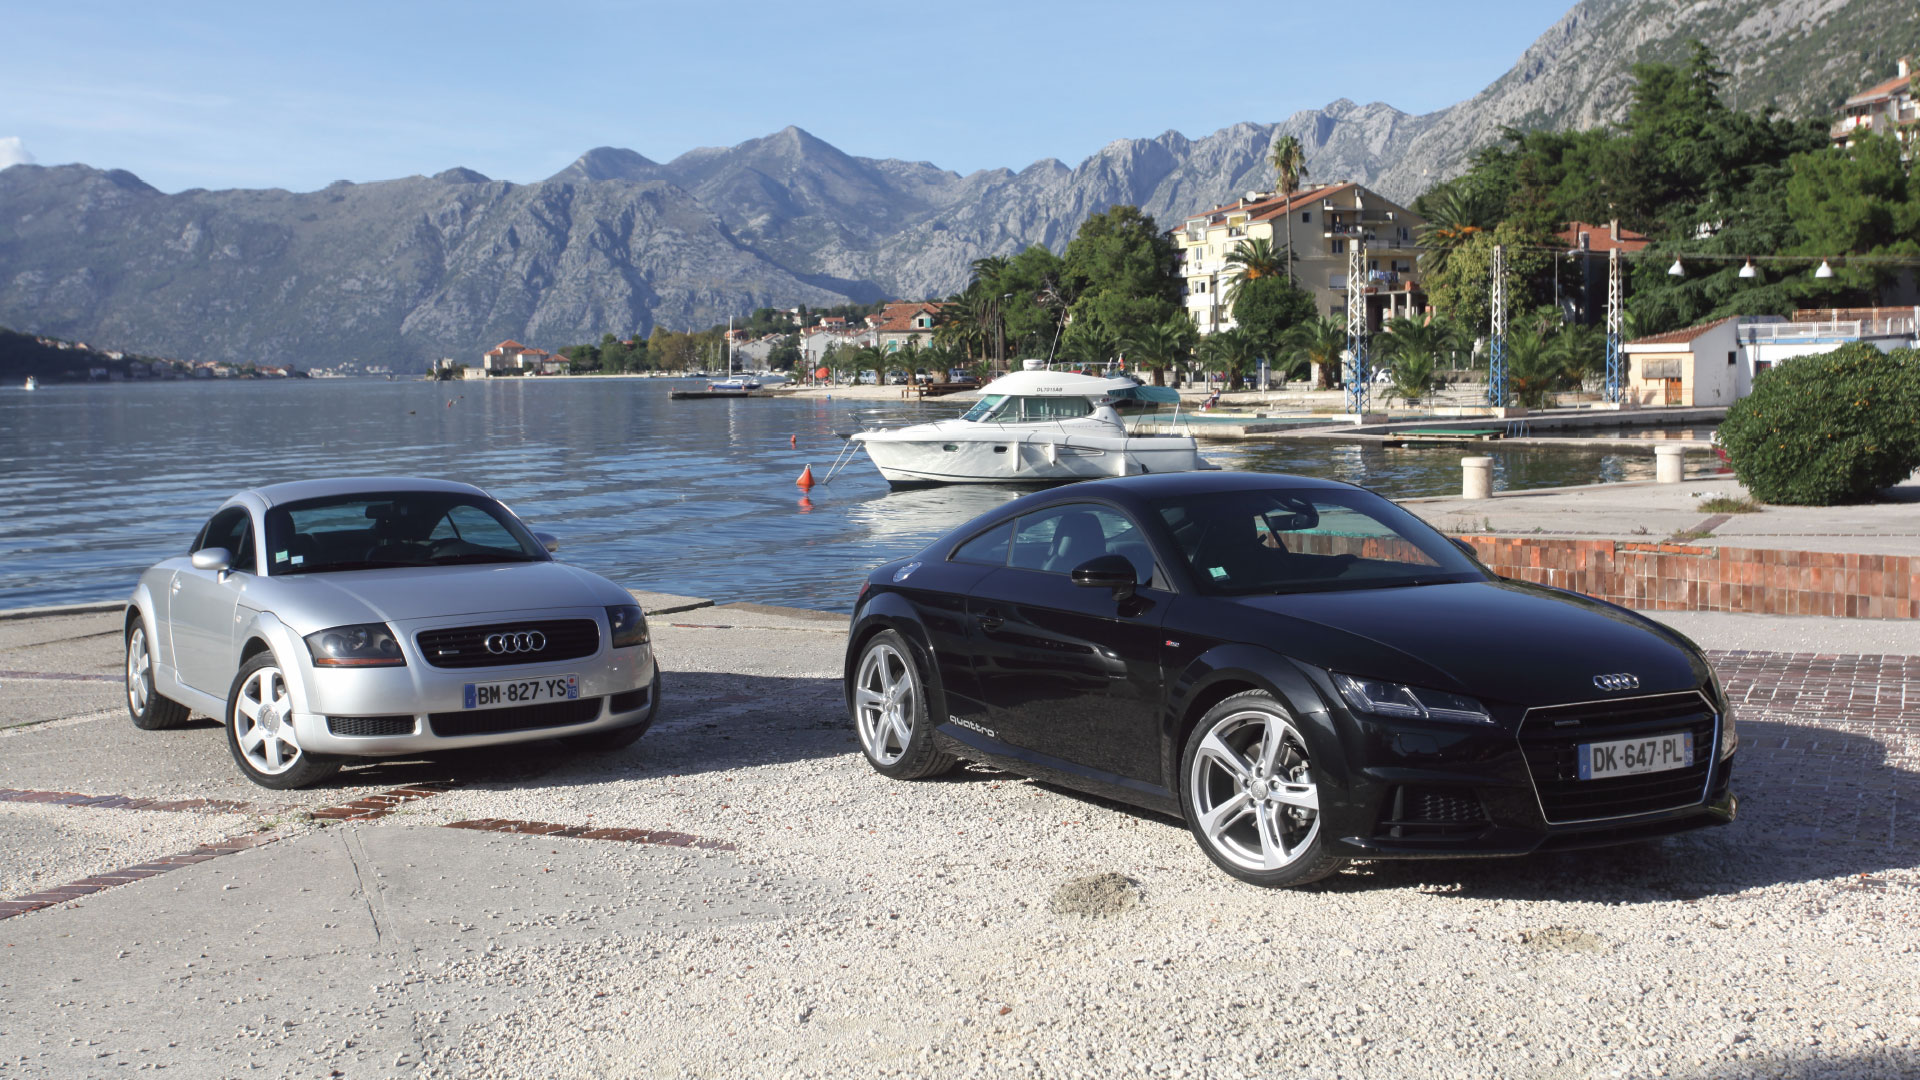 TT coupé quattro Mk1 vs TT coupé quattro Mk3